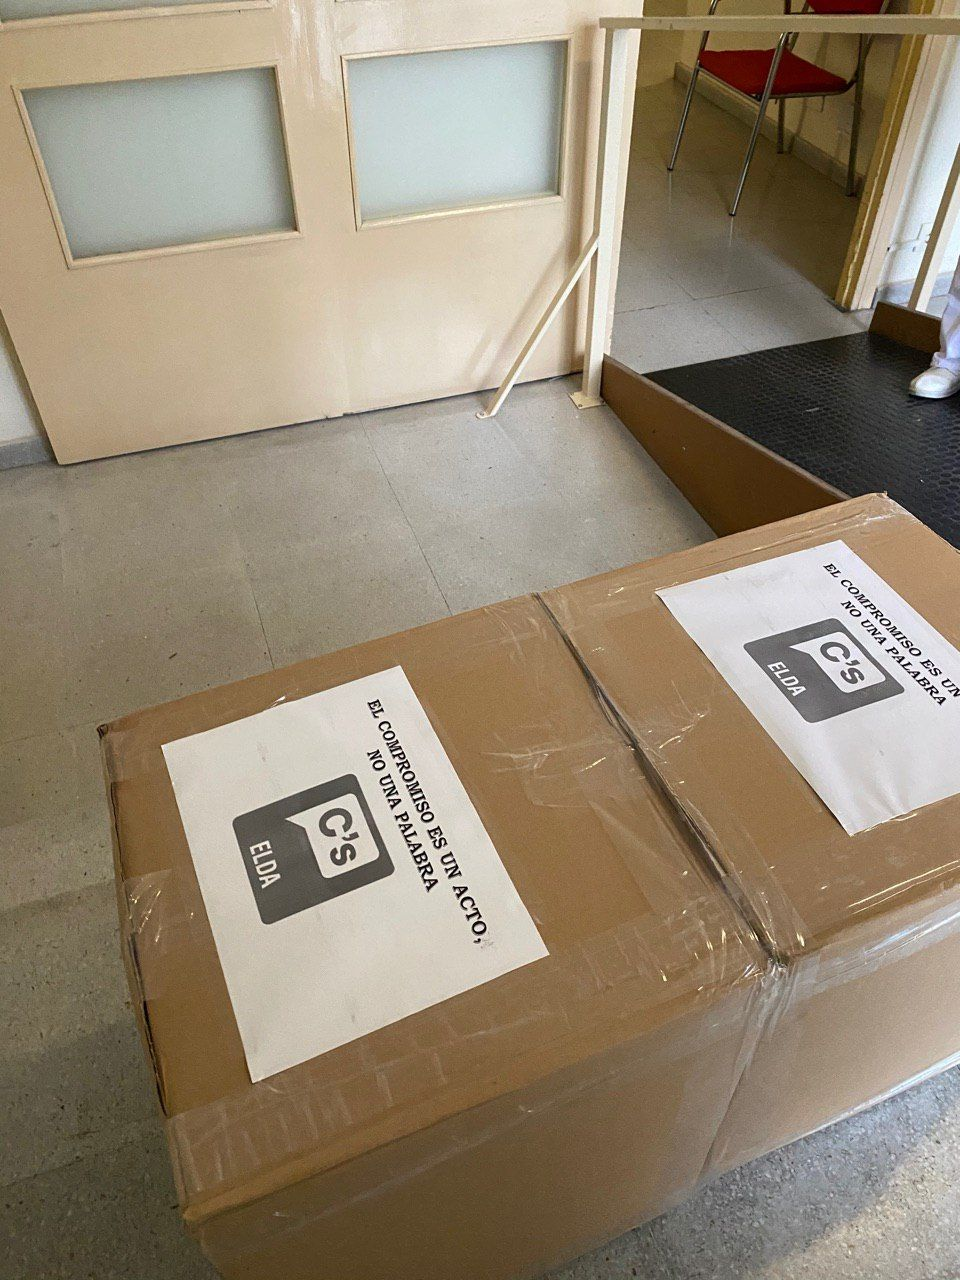 Hemos comprado 5.000 euros de material sanitario donando cada concejal 1000 euros